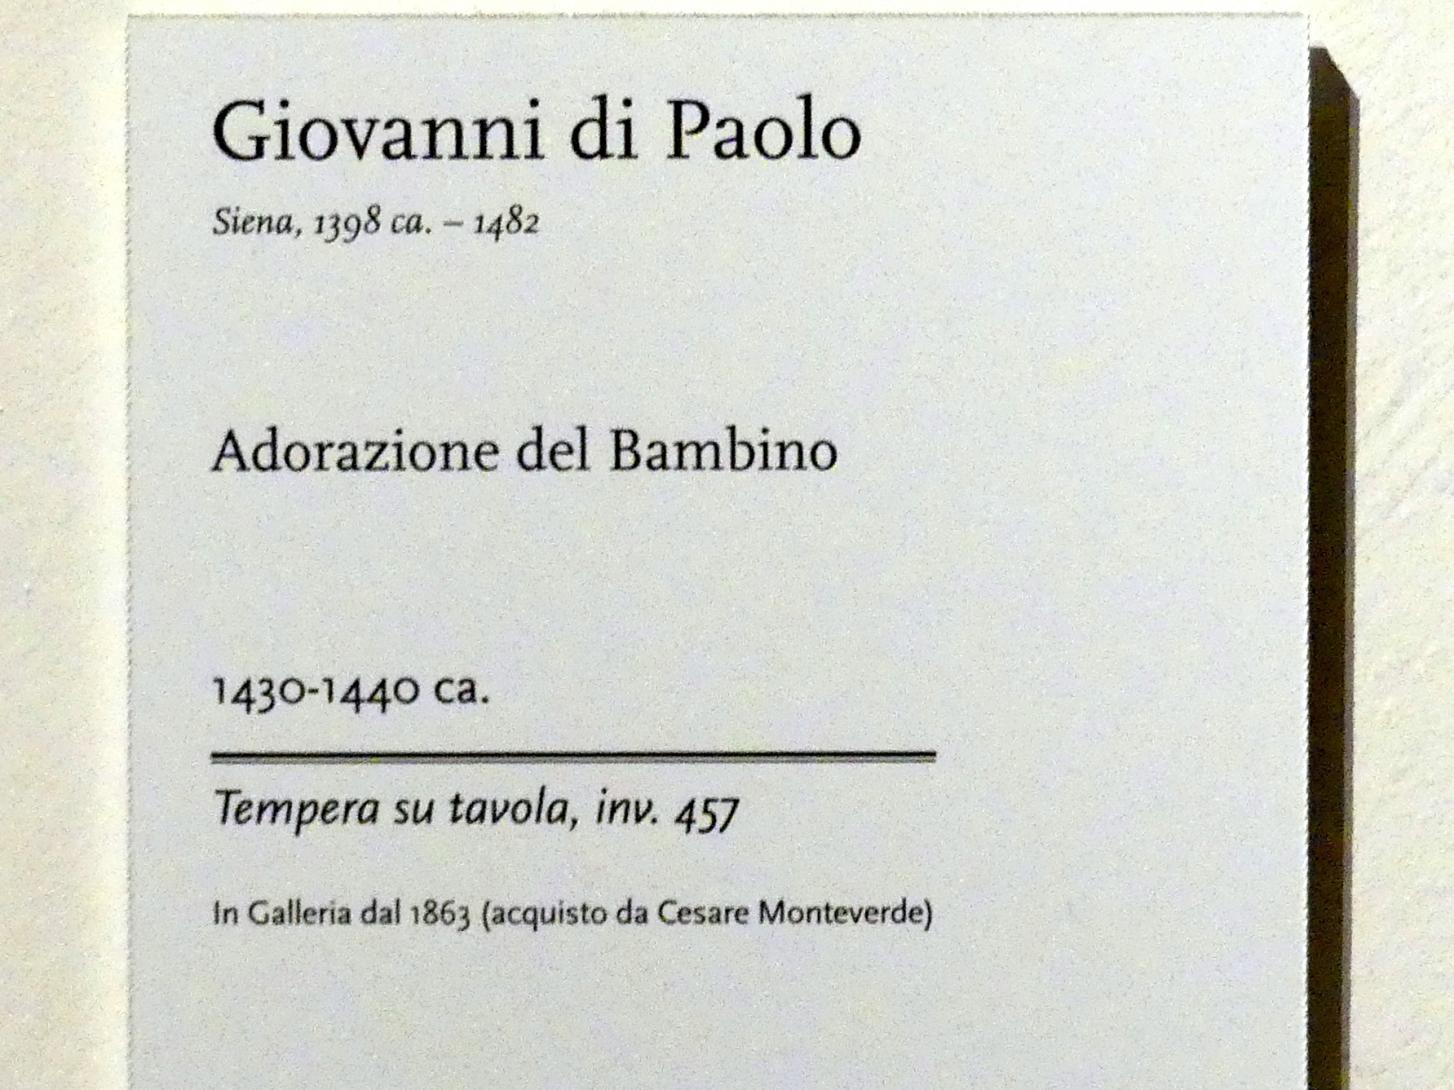 Giovanni di Paolo: Anbetung des Chrstkindes, um 1430 - 1440, Bild 2/2